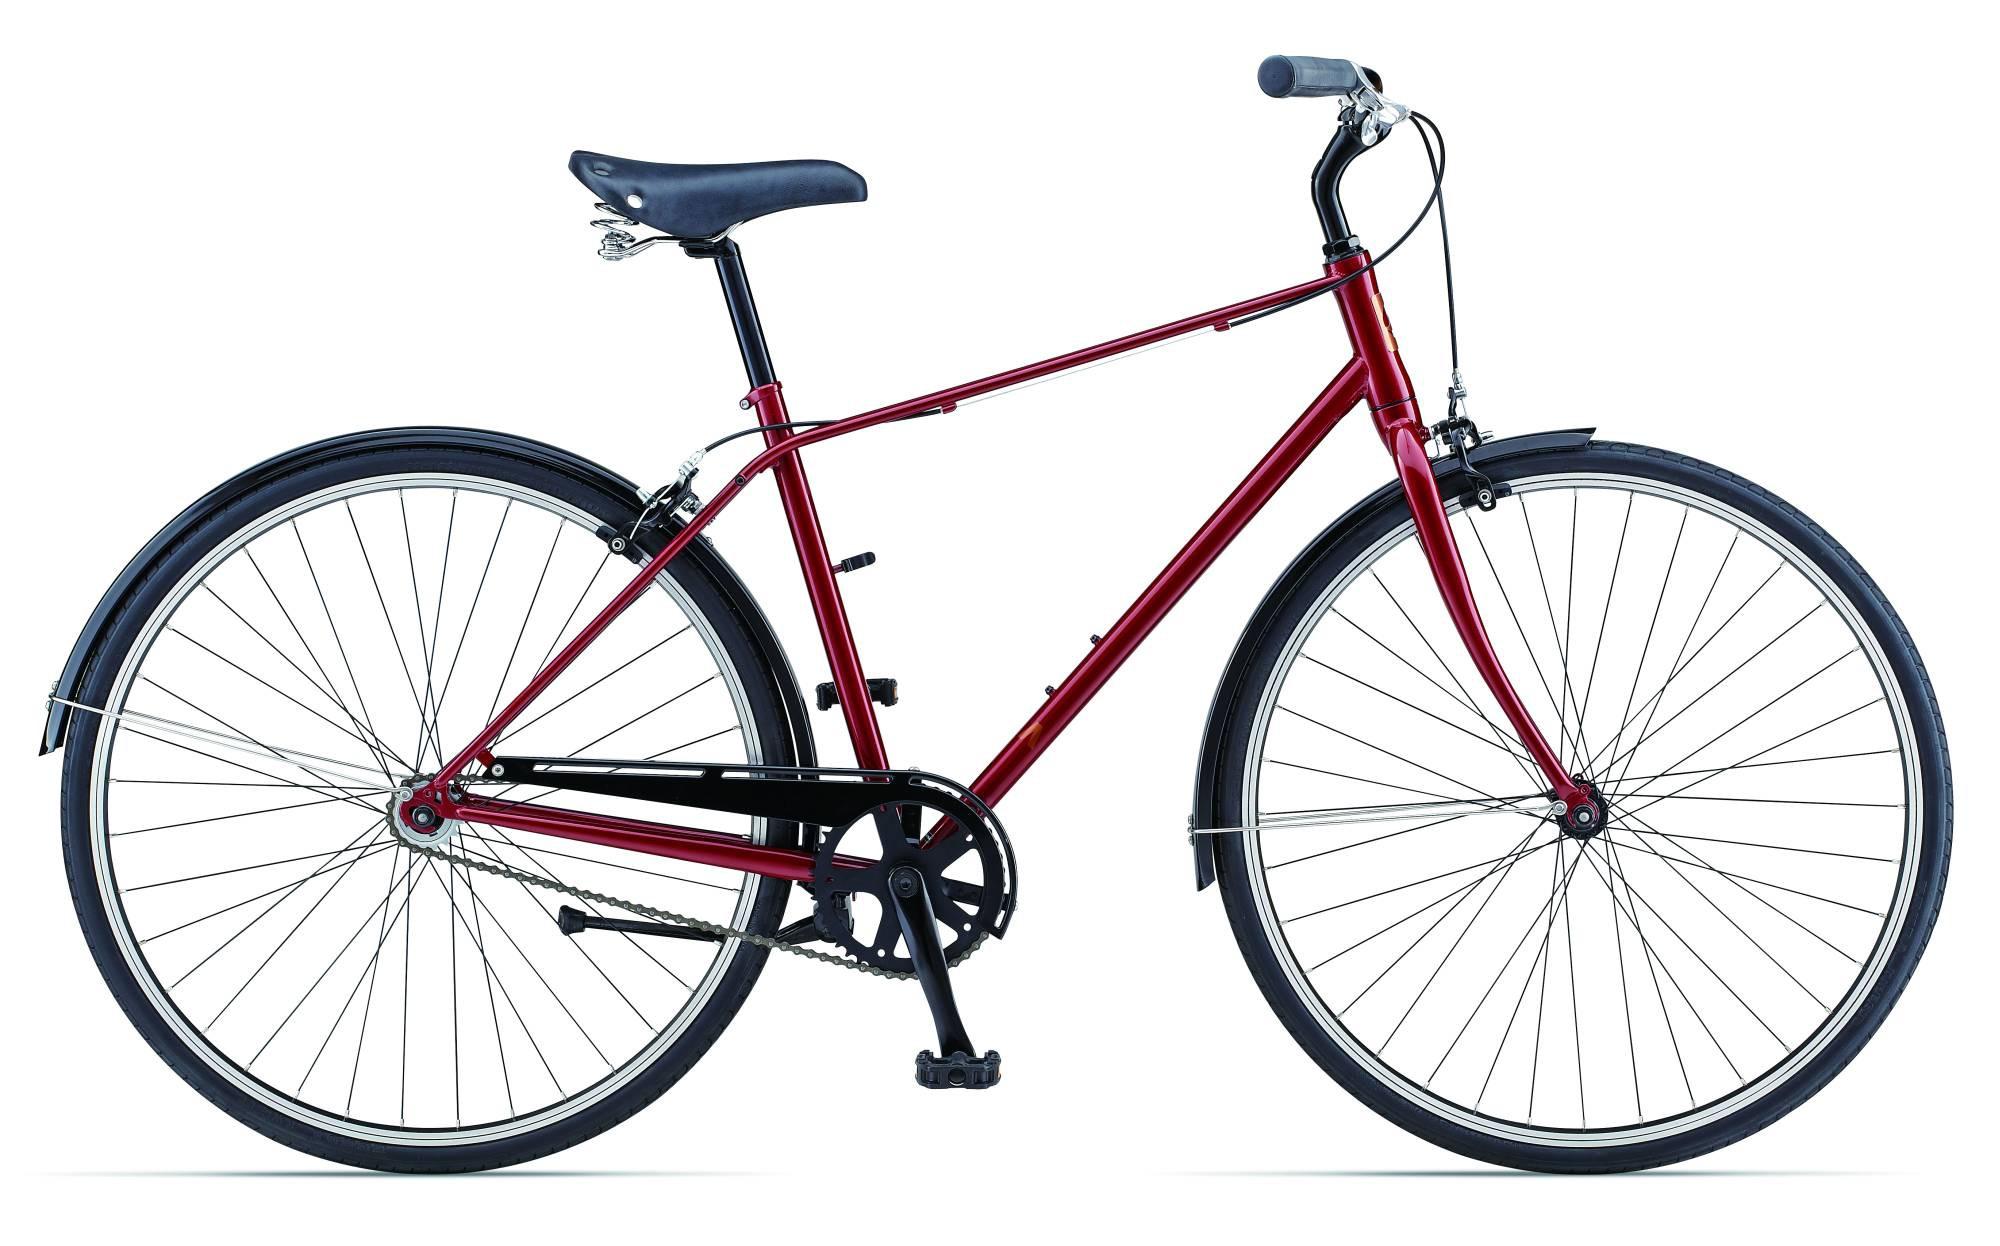 Комфортный велосипед Giant Via 3 (2013) от Velogrand